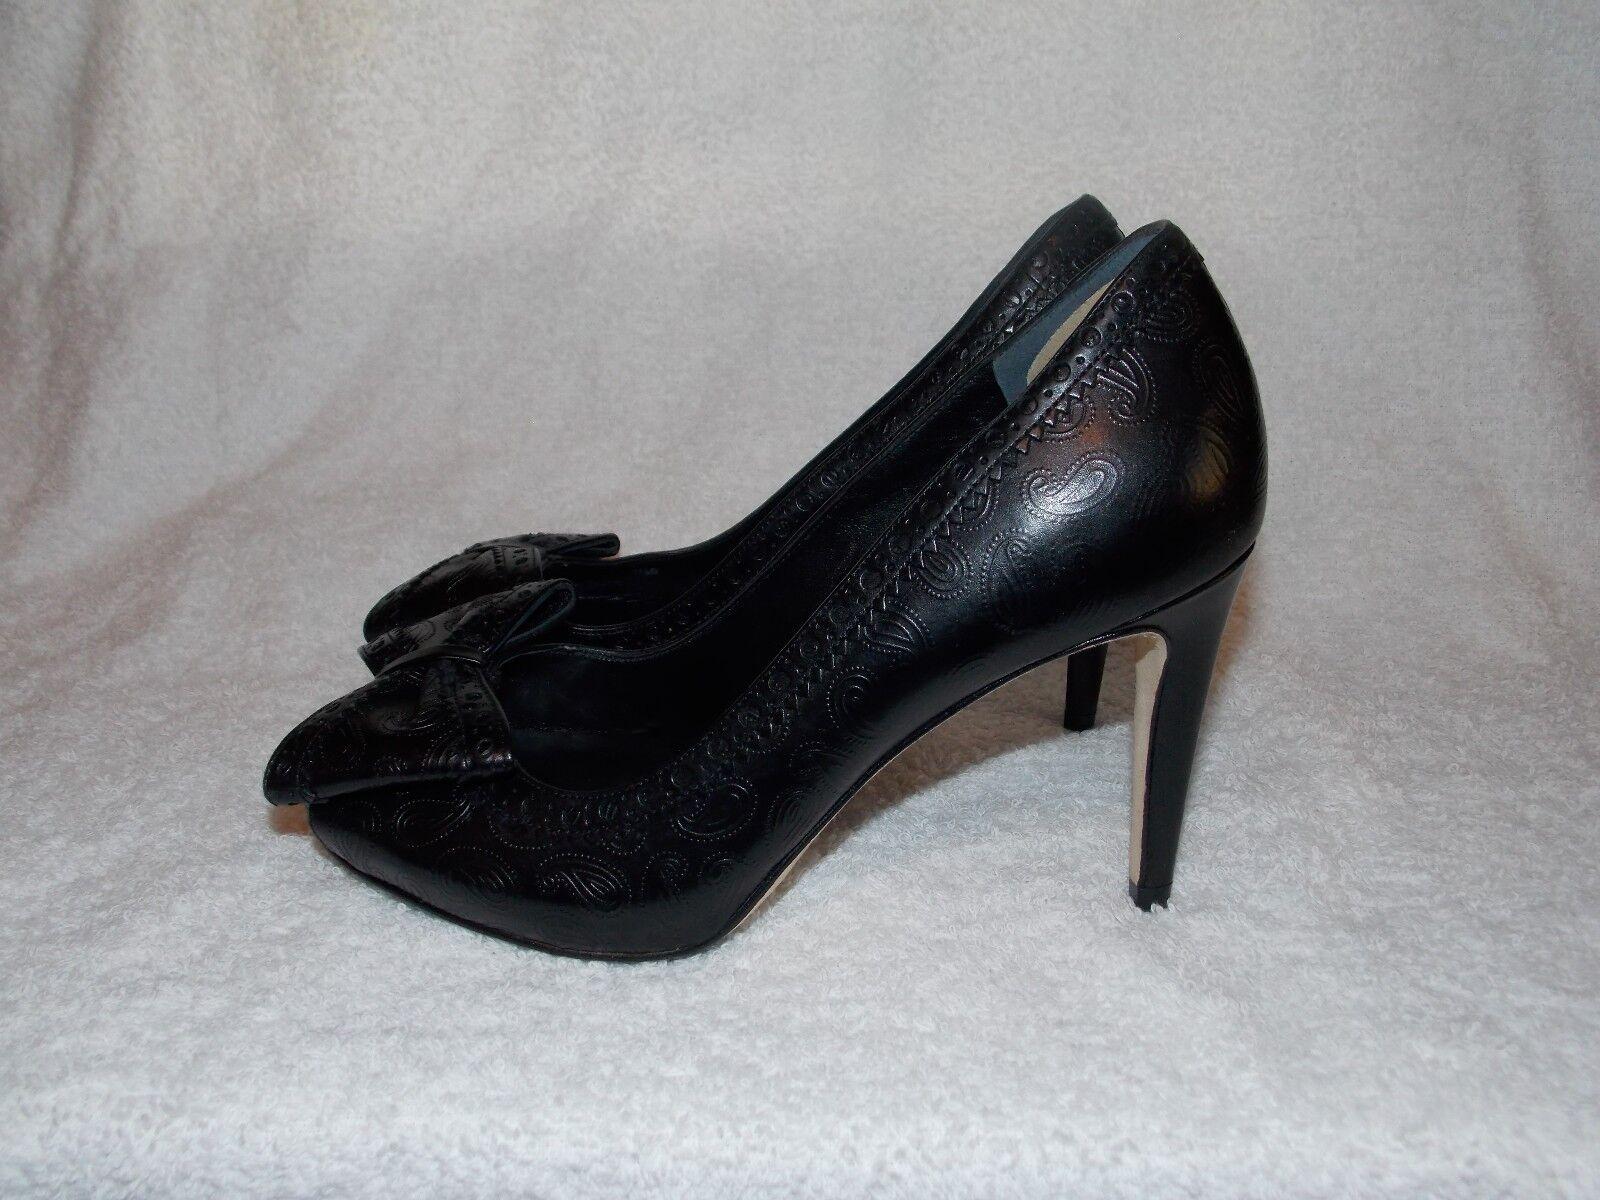 Cole Haan VIOLET AIR OT BOW Black Peep Toe Pump Heels 5.5B For Women Used